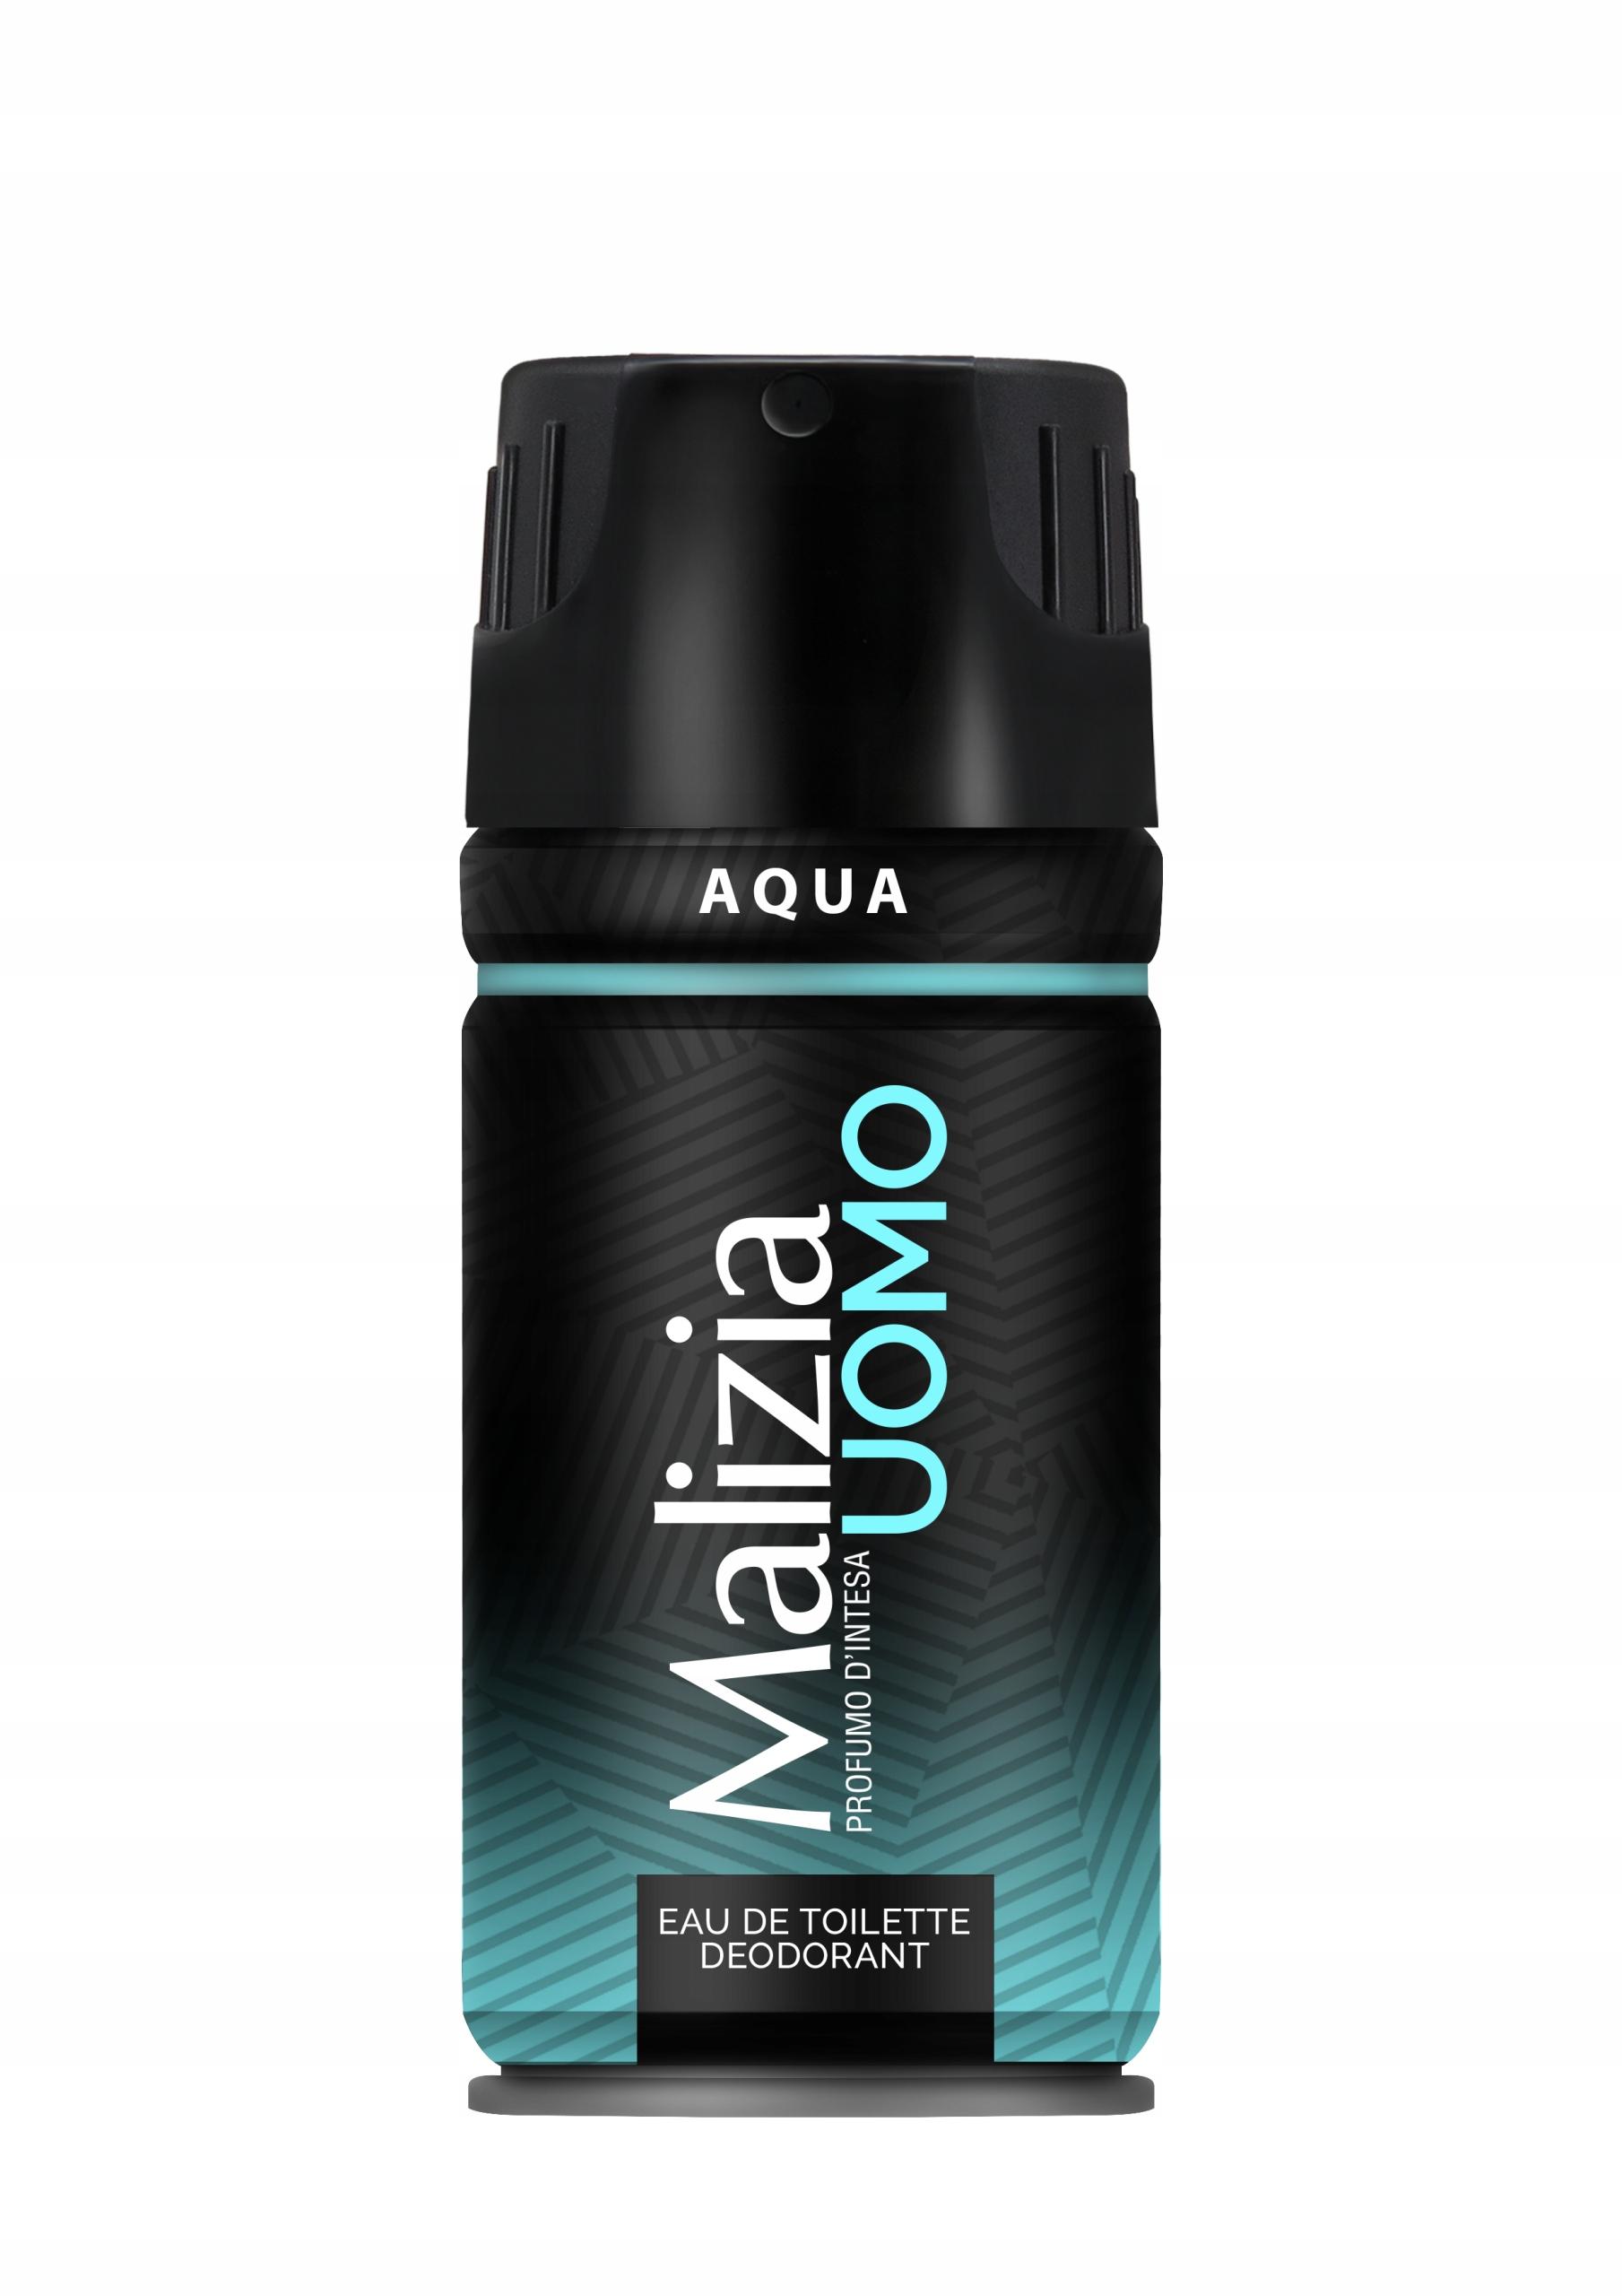 Malizia Uomo Aqua мужской дезодорант-спрей 150 мл